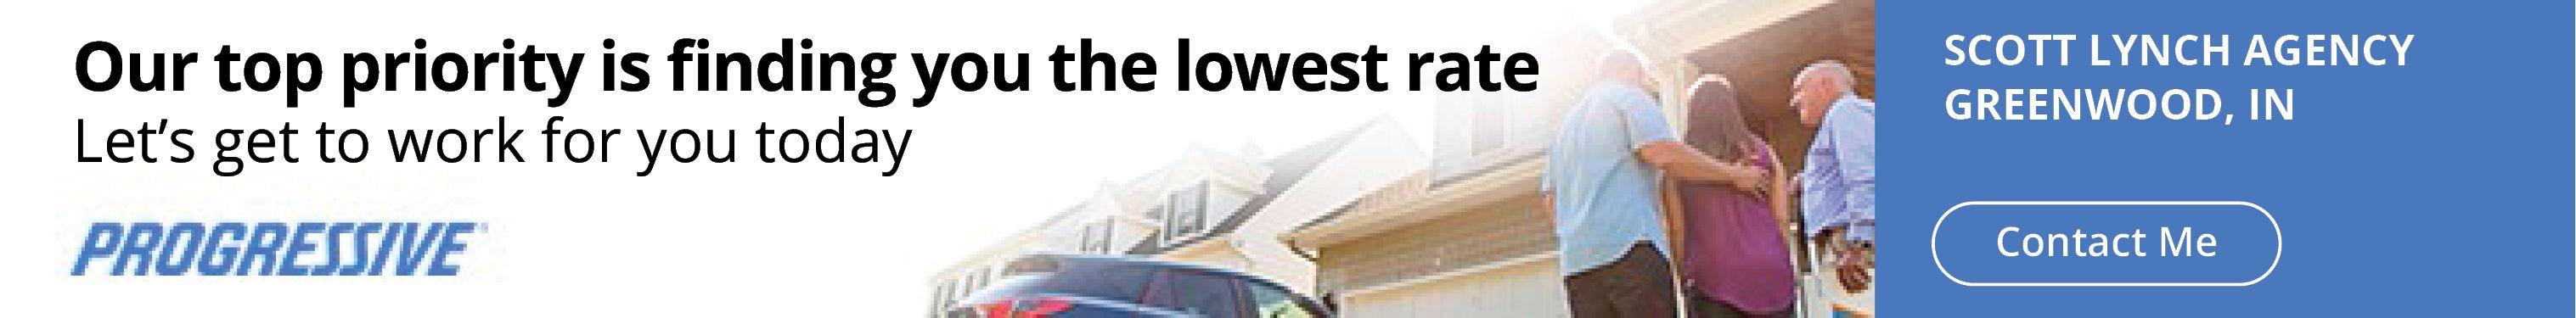 While Erie Insurance is our preferred partner, Progressive